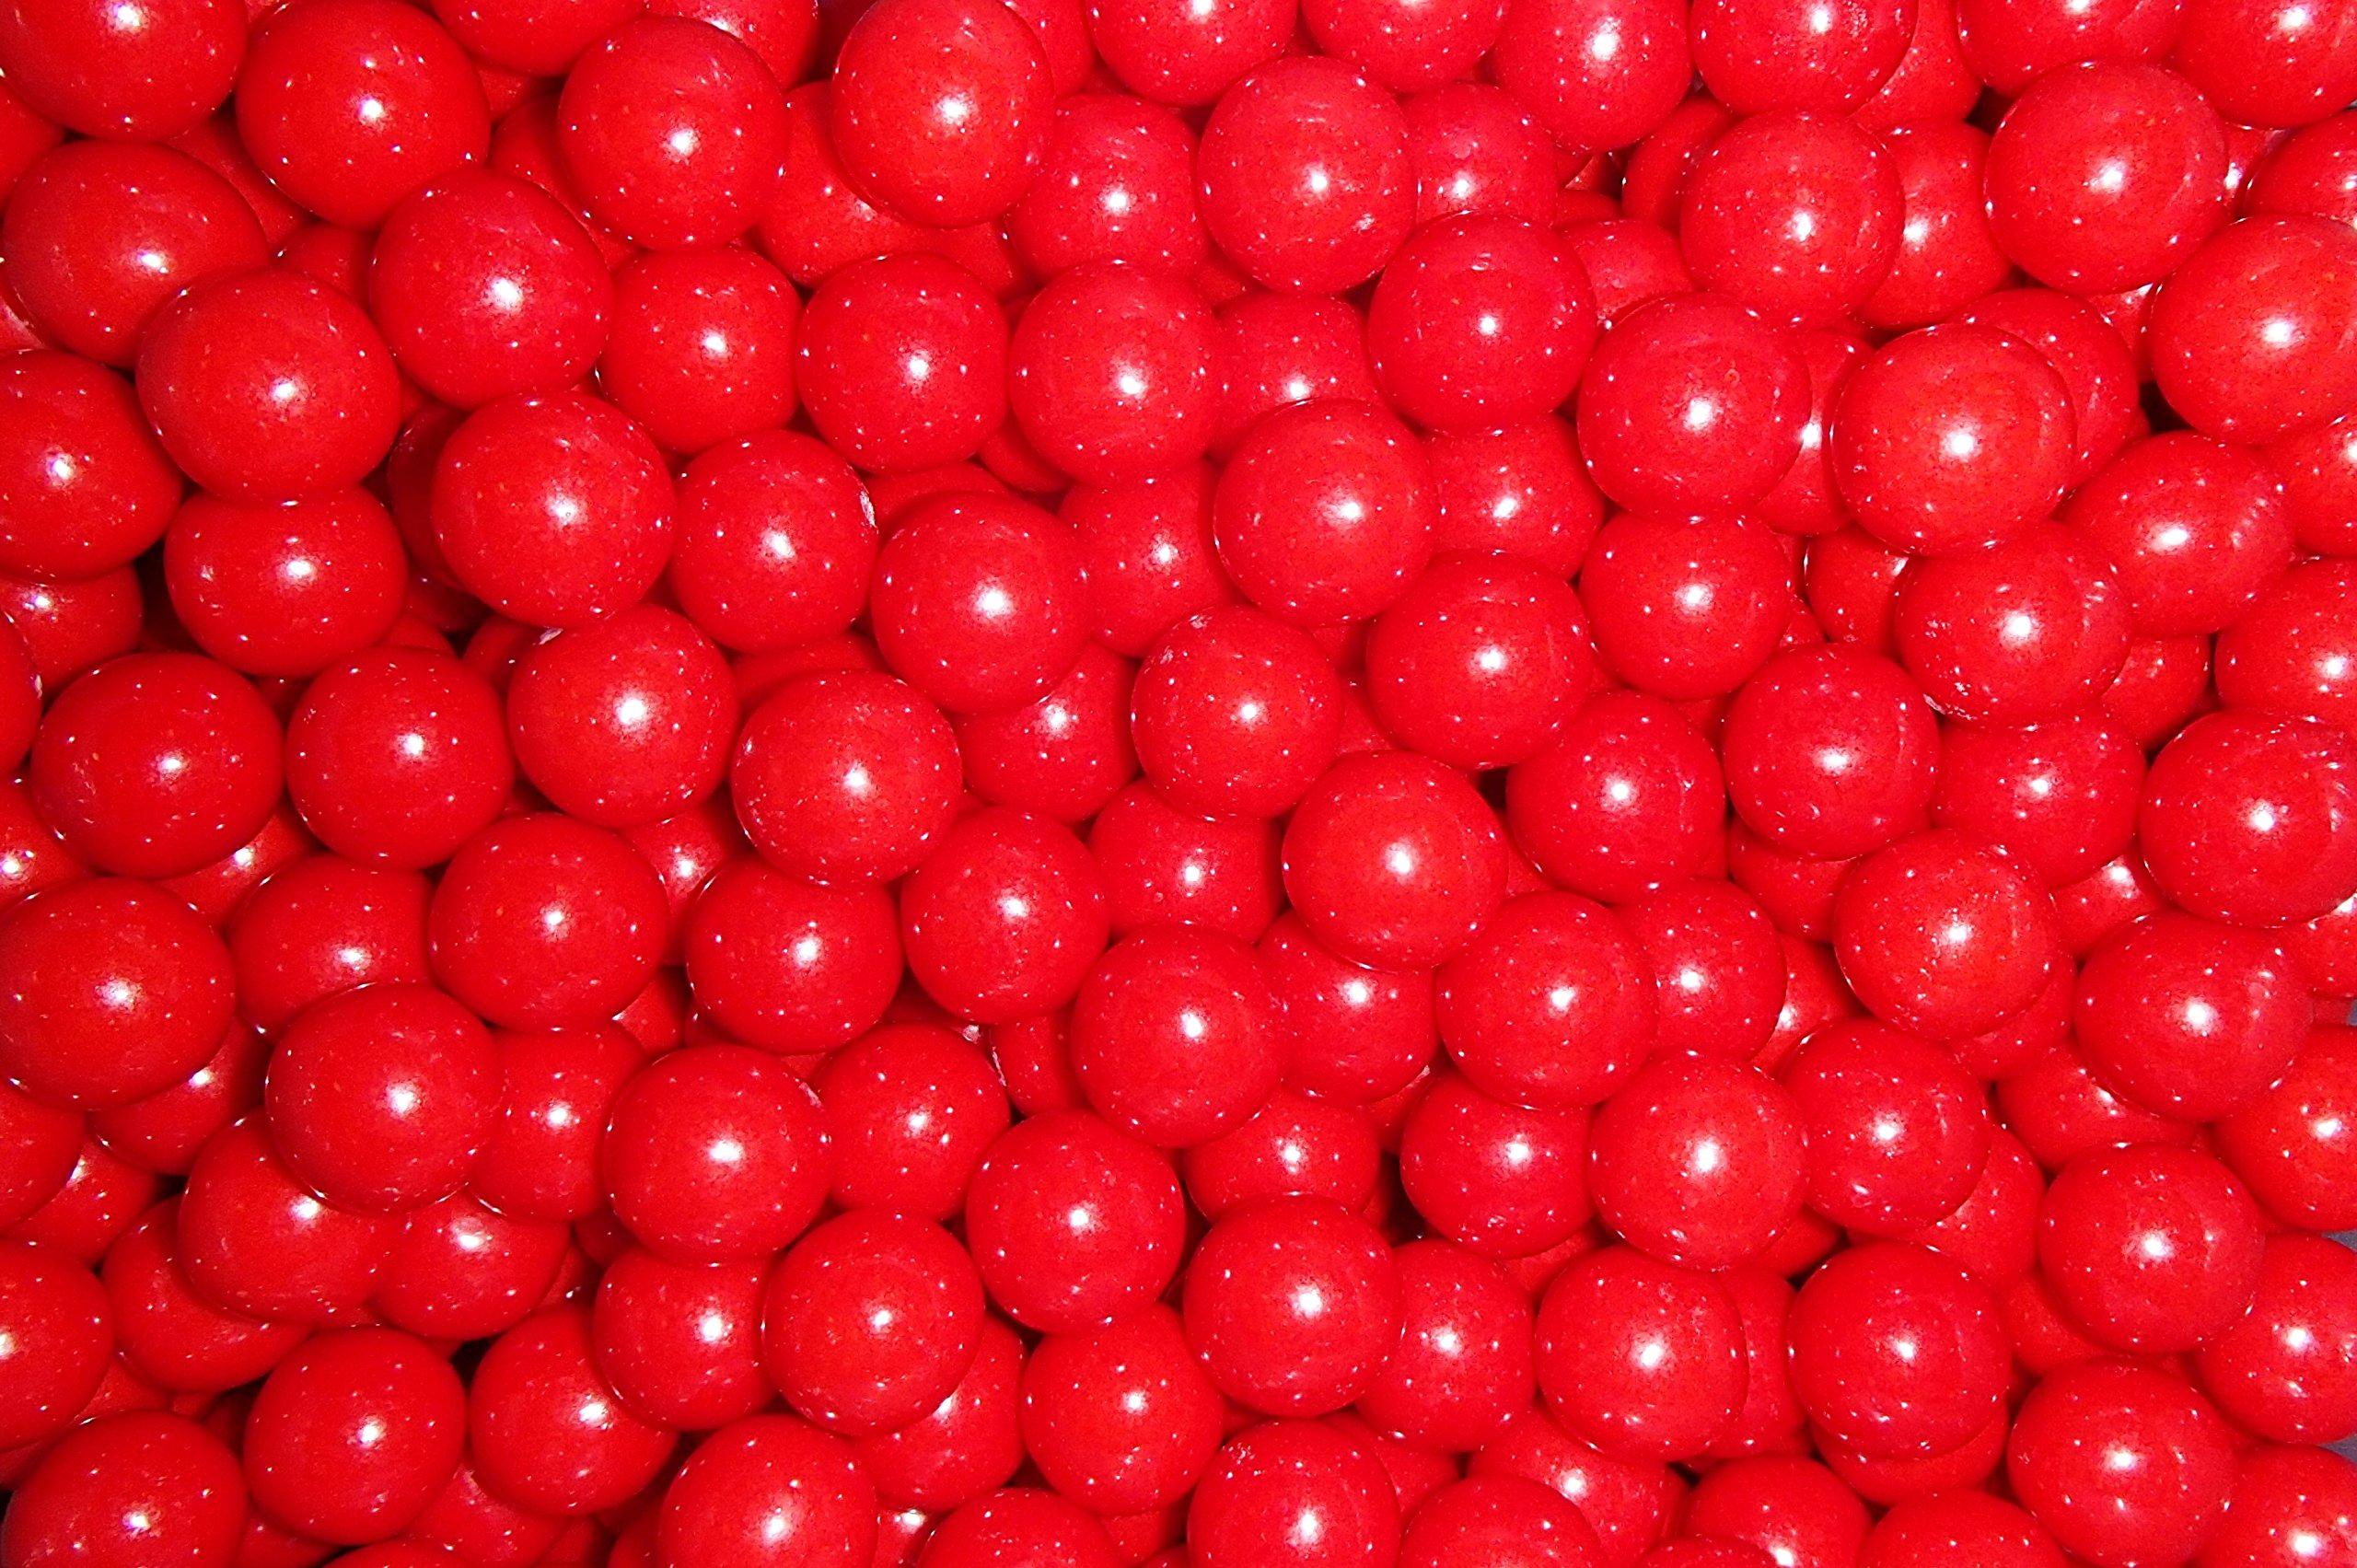 Sweet S Sour Cherry Balls 2 Pound Buy Online In Dominica At Desertcart